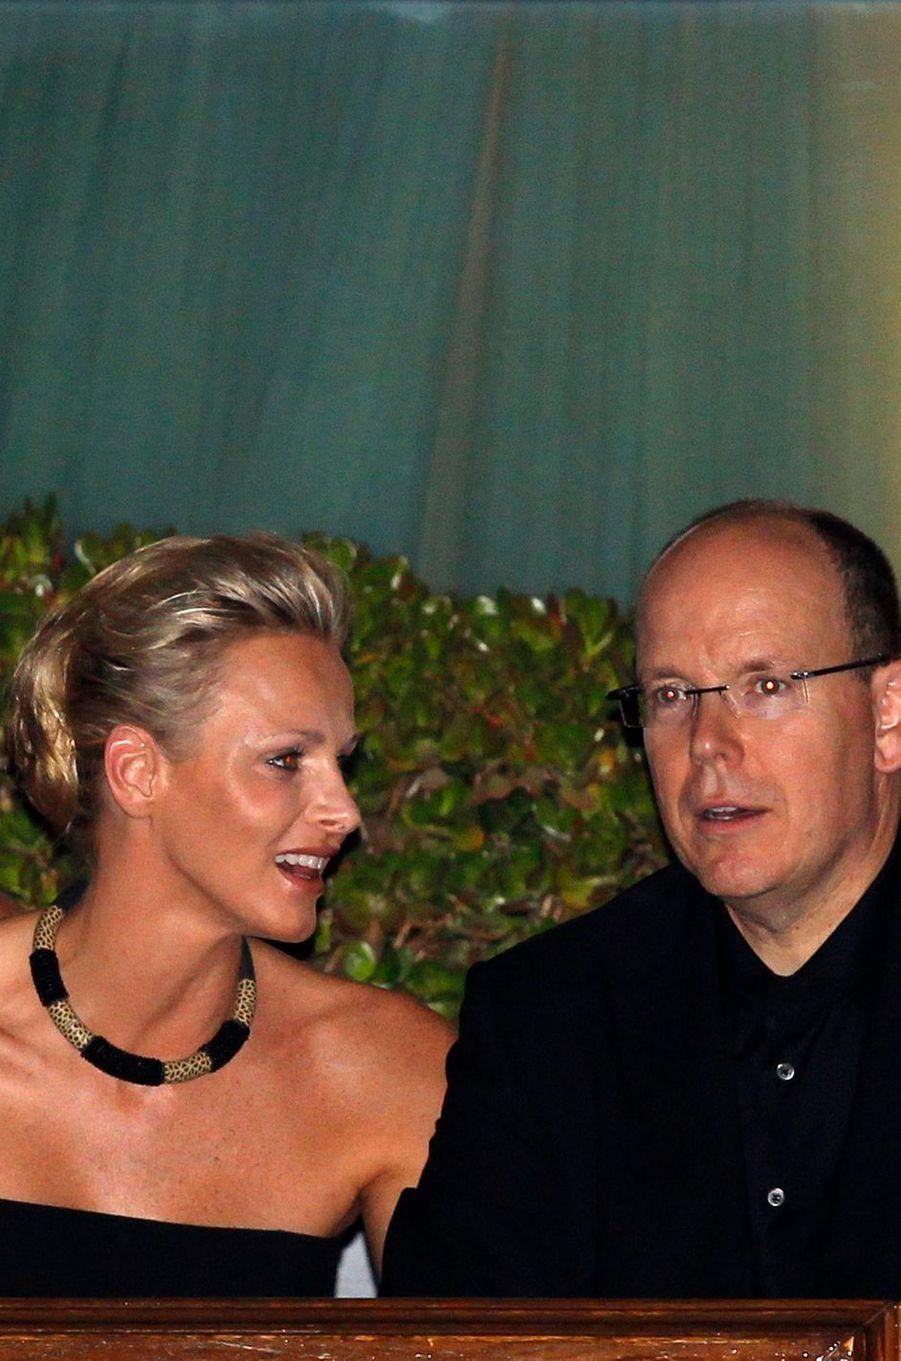 Charlène Wittstock et le prince Albert II de Monaco au stade Louis-II à Monaco, le 30 juin 2011